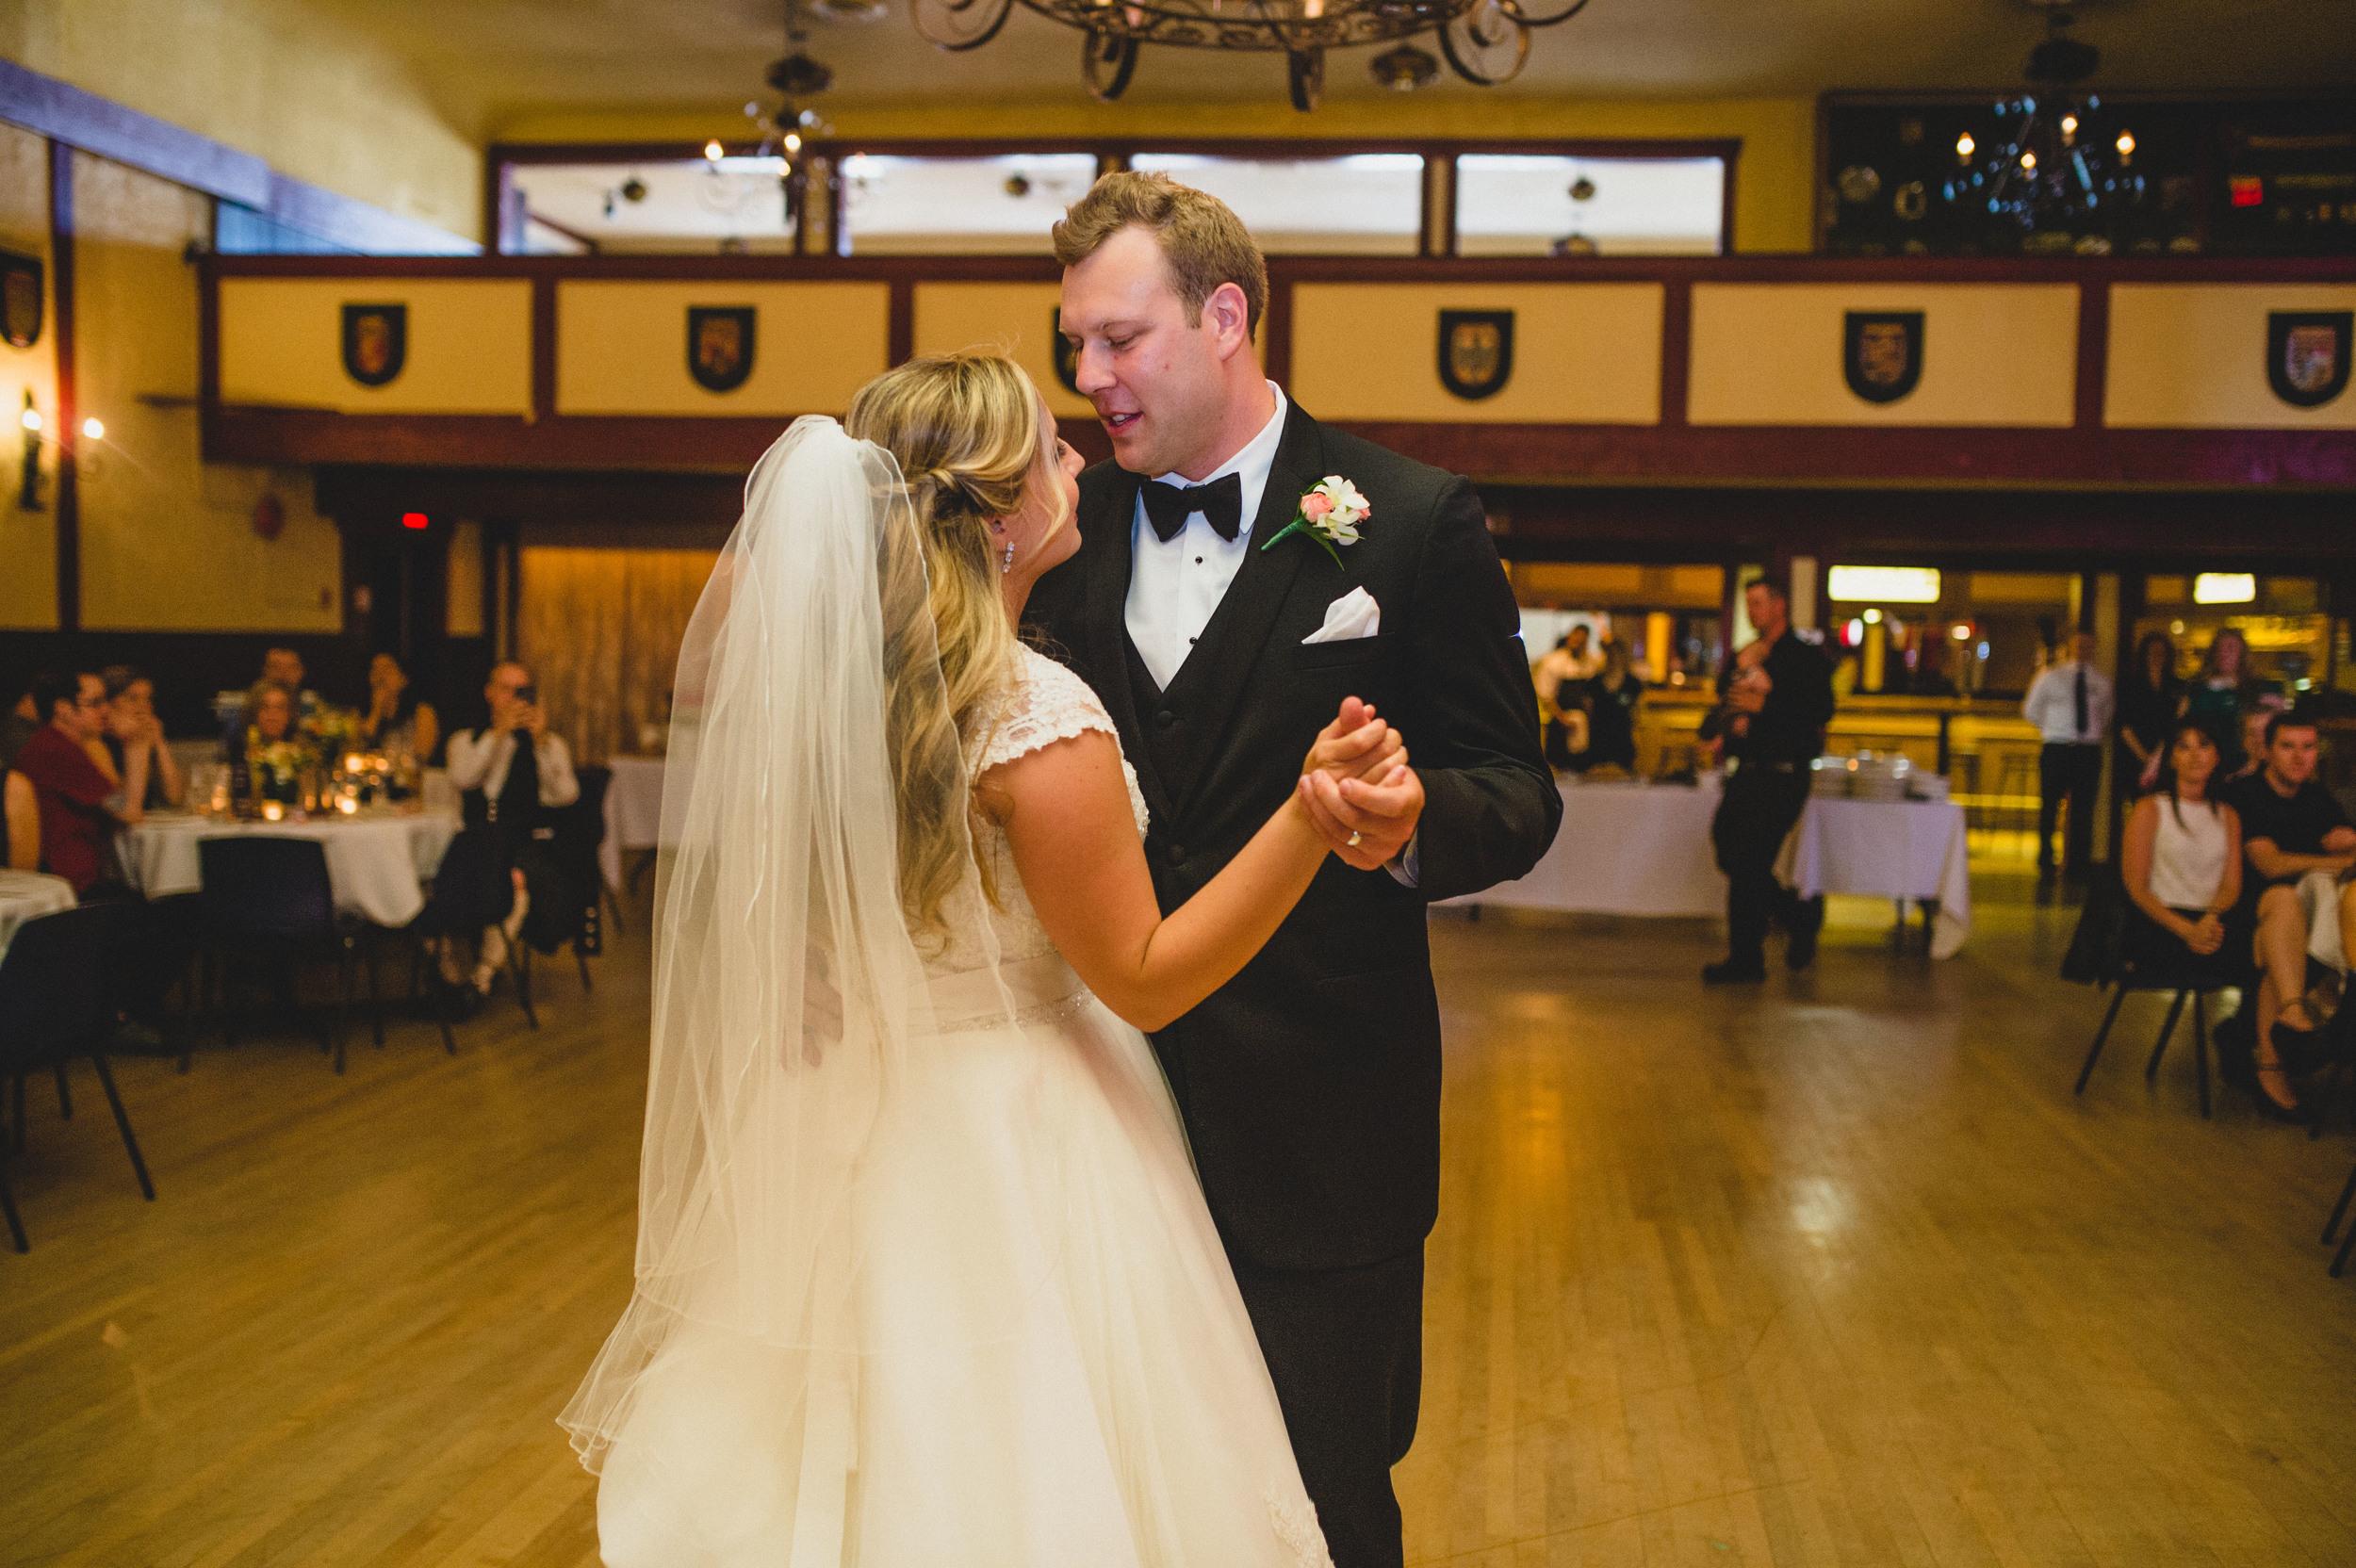 Vancouver St Augustine 's Church wedding photographer edward lai photography-74.jpg